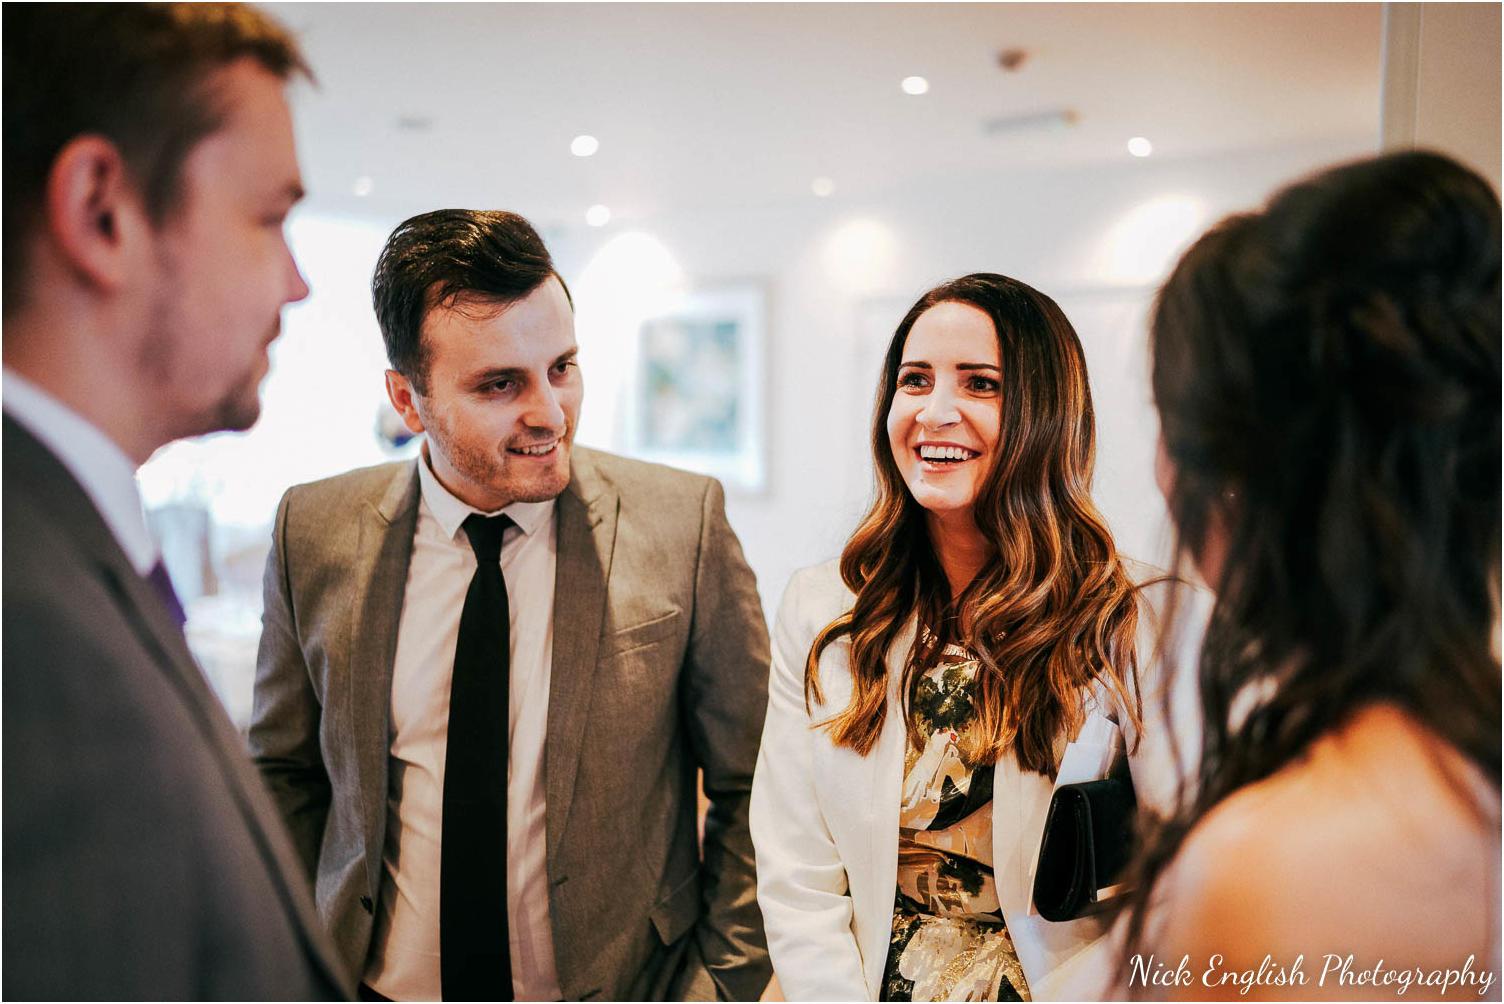 Mitton_Hall_Wedding_Photographer_2018-107.jpg